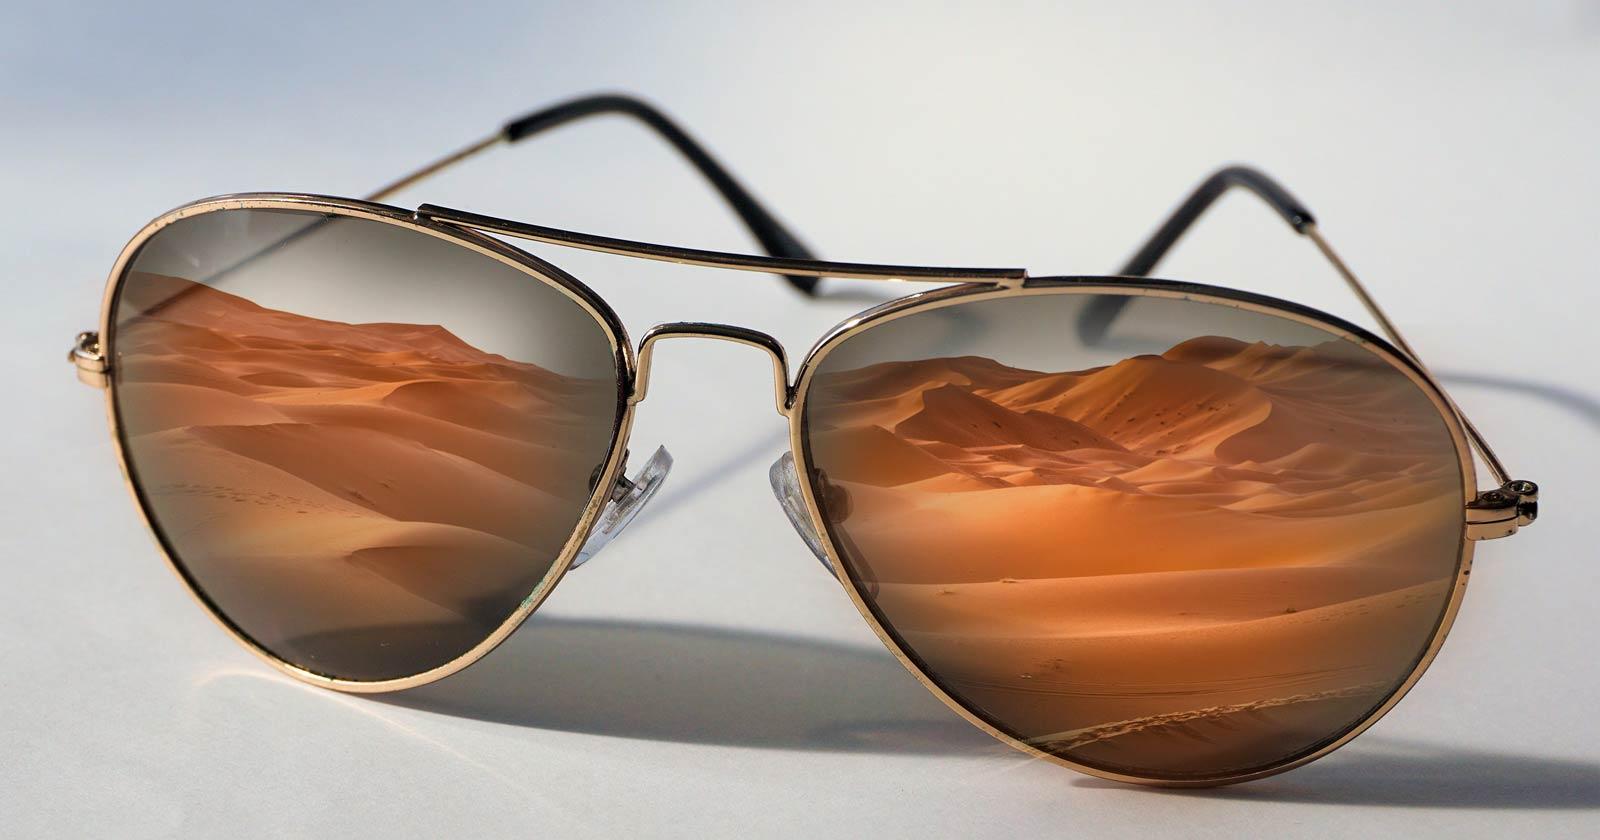 The History of Aviator Sunglasses